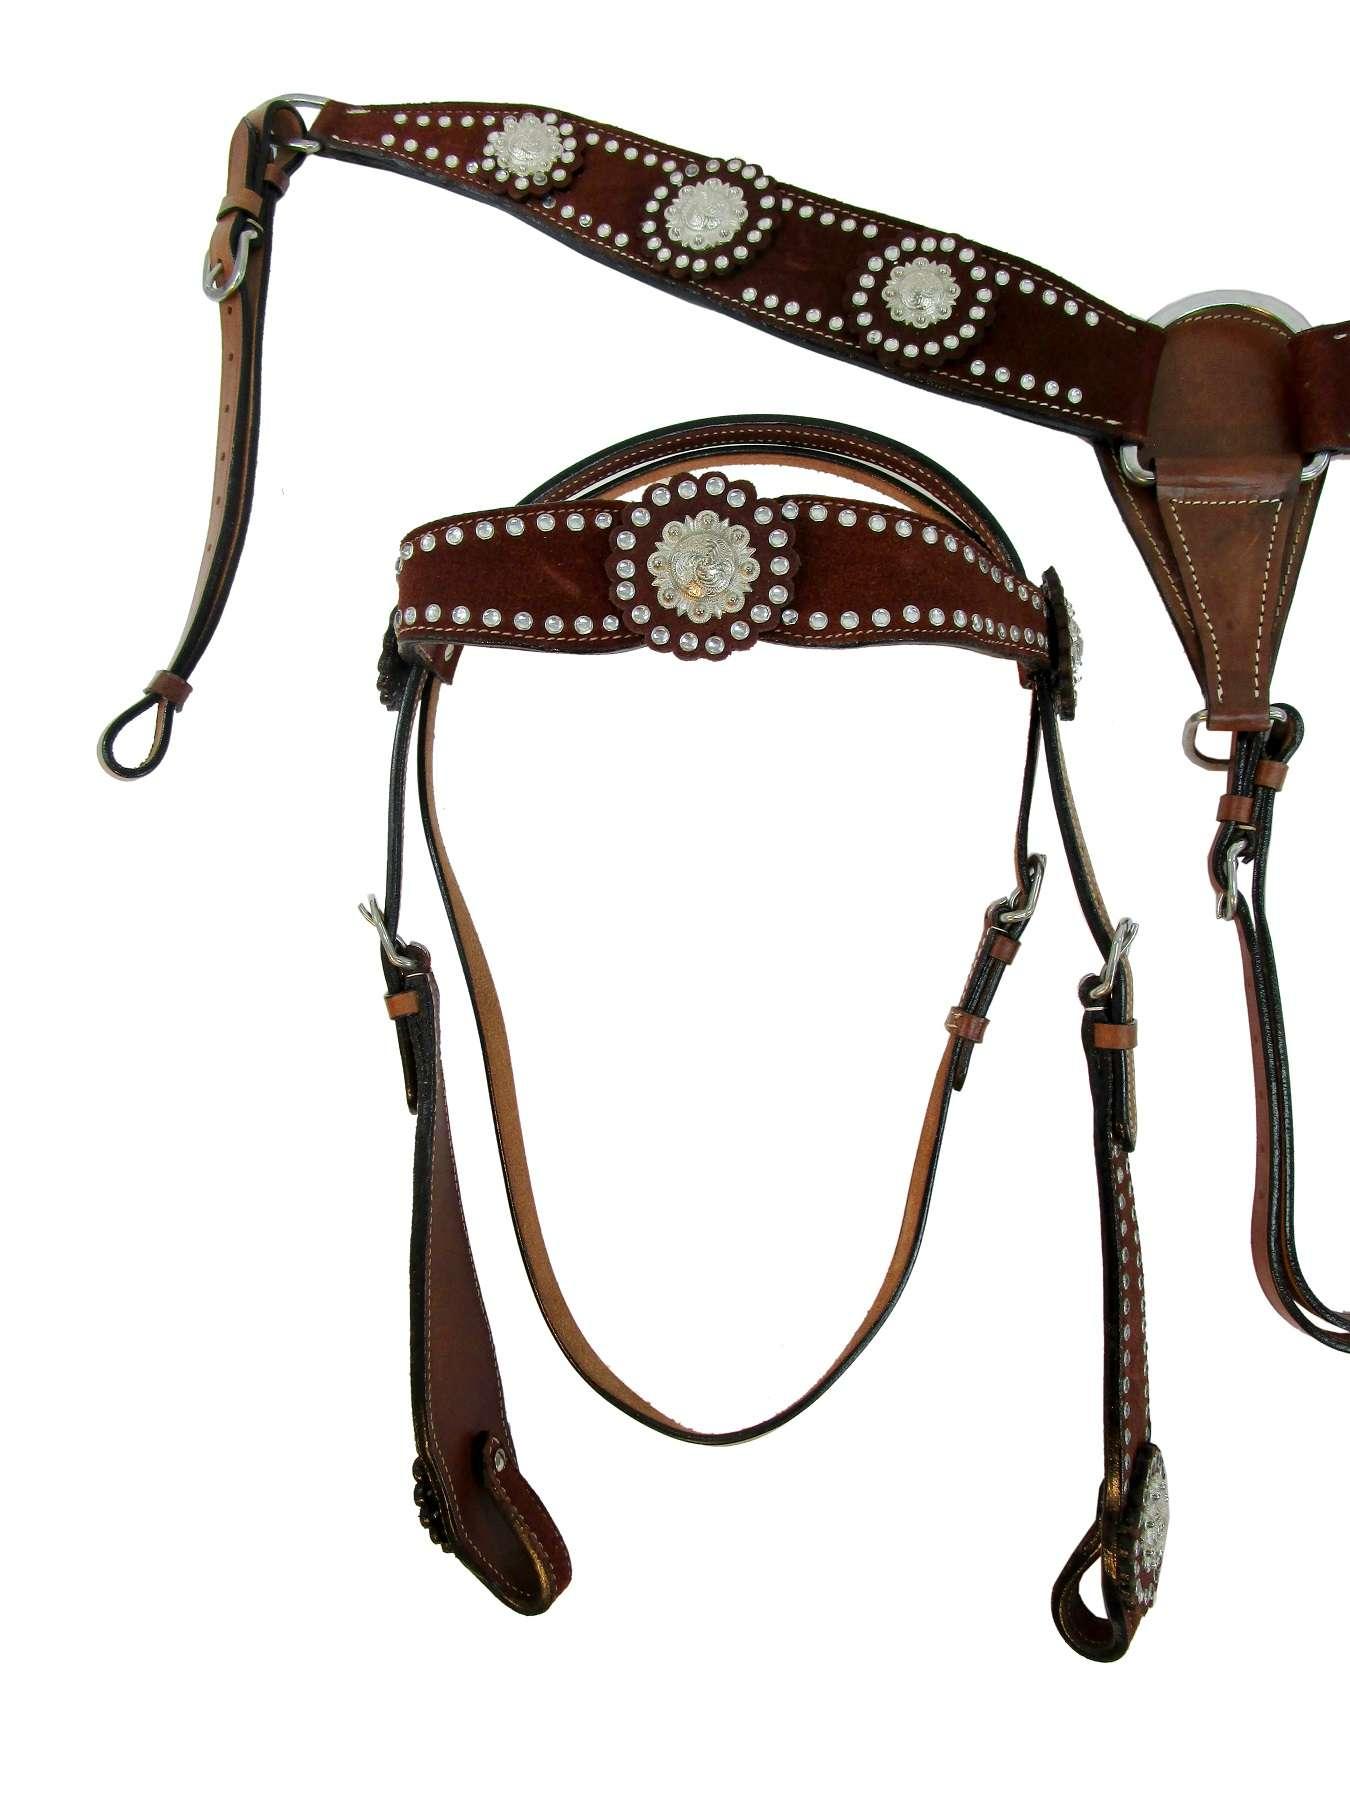 WESTERN BRIDLE HORSE HEADSTALL BREAST COLLAR BROWN LEATHER BARREL PLEASURE TRAIL